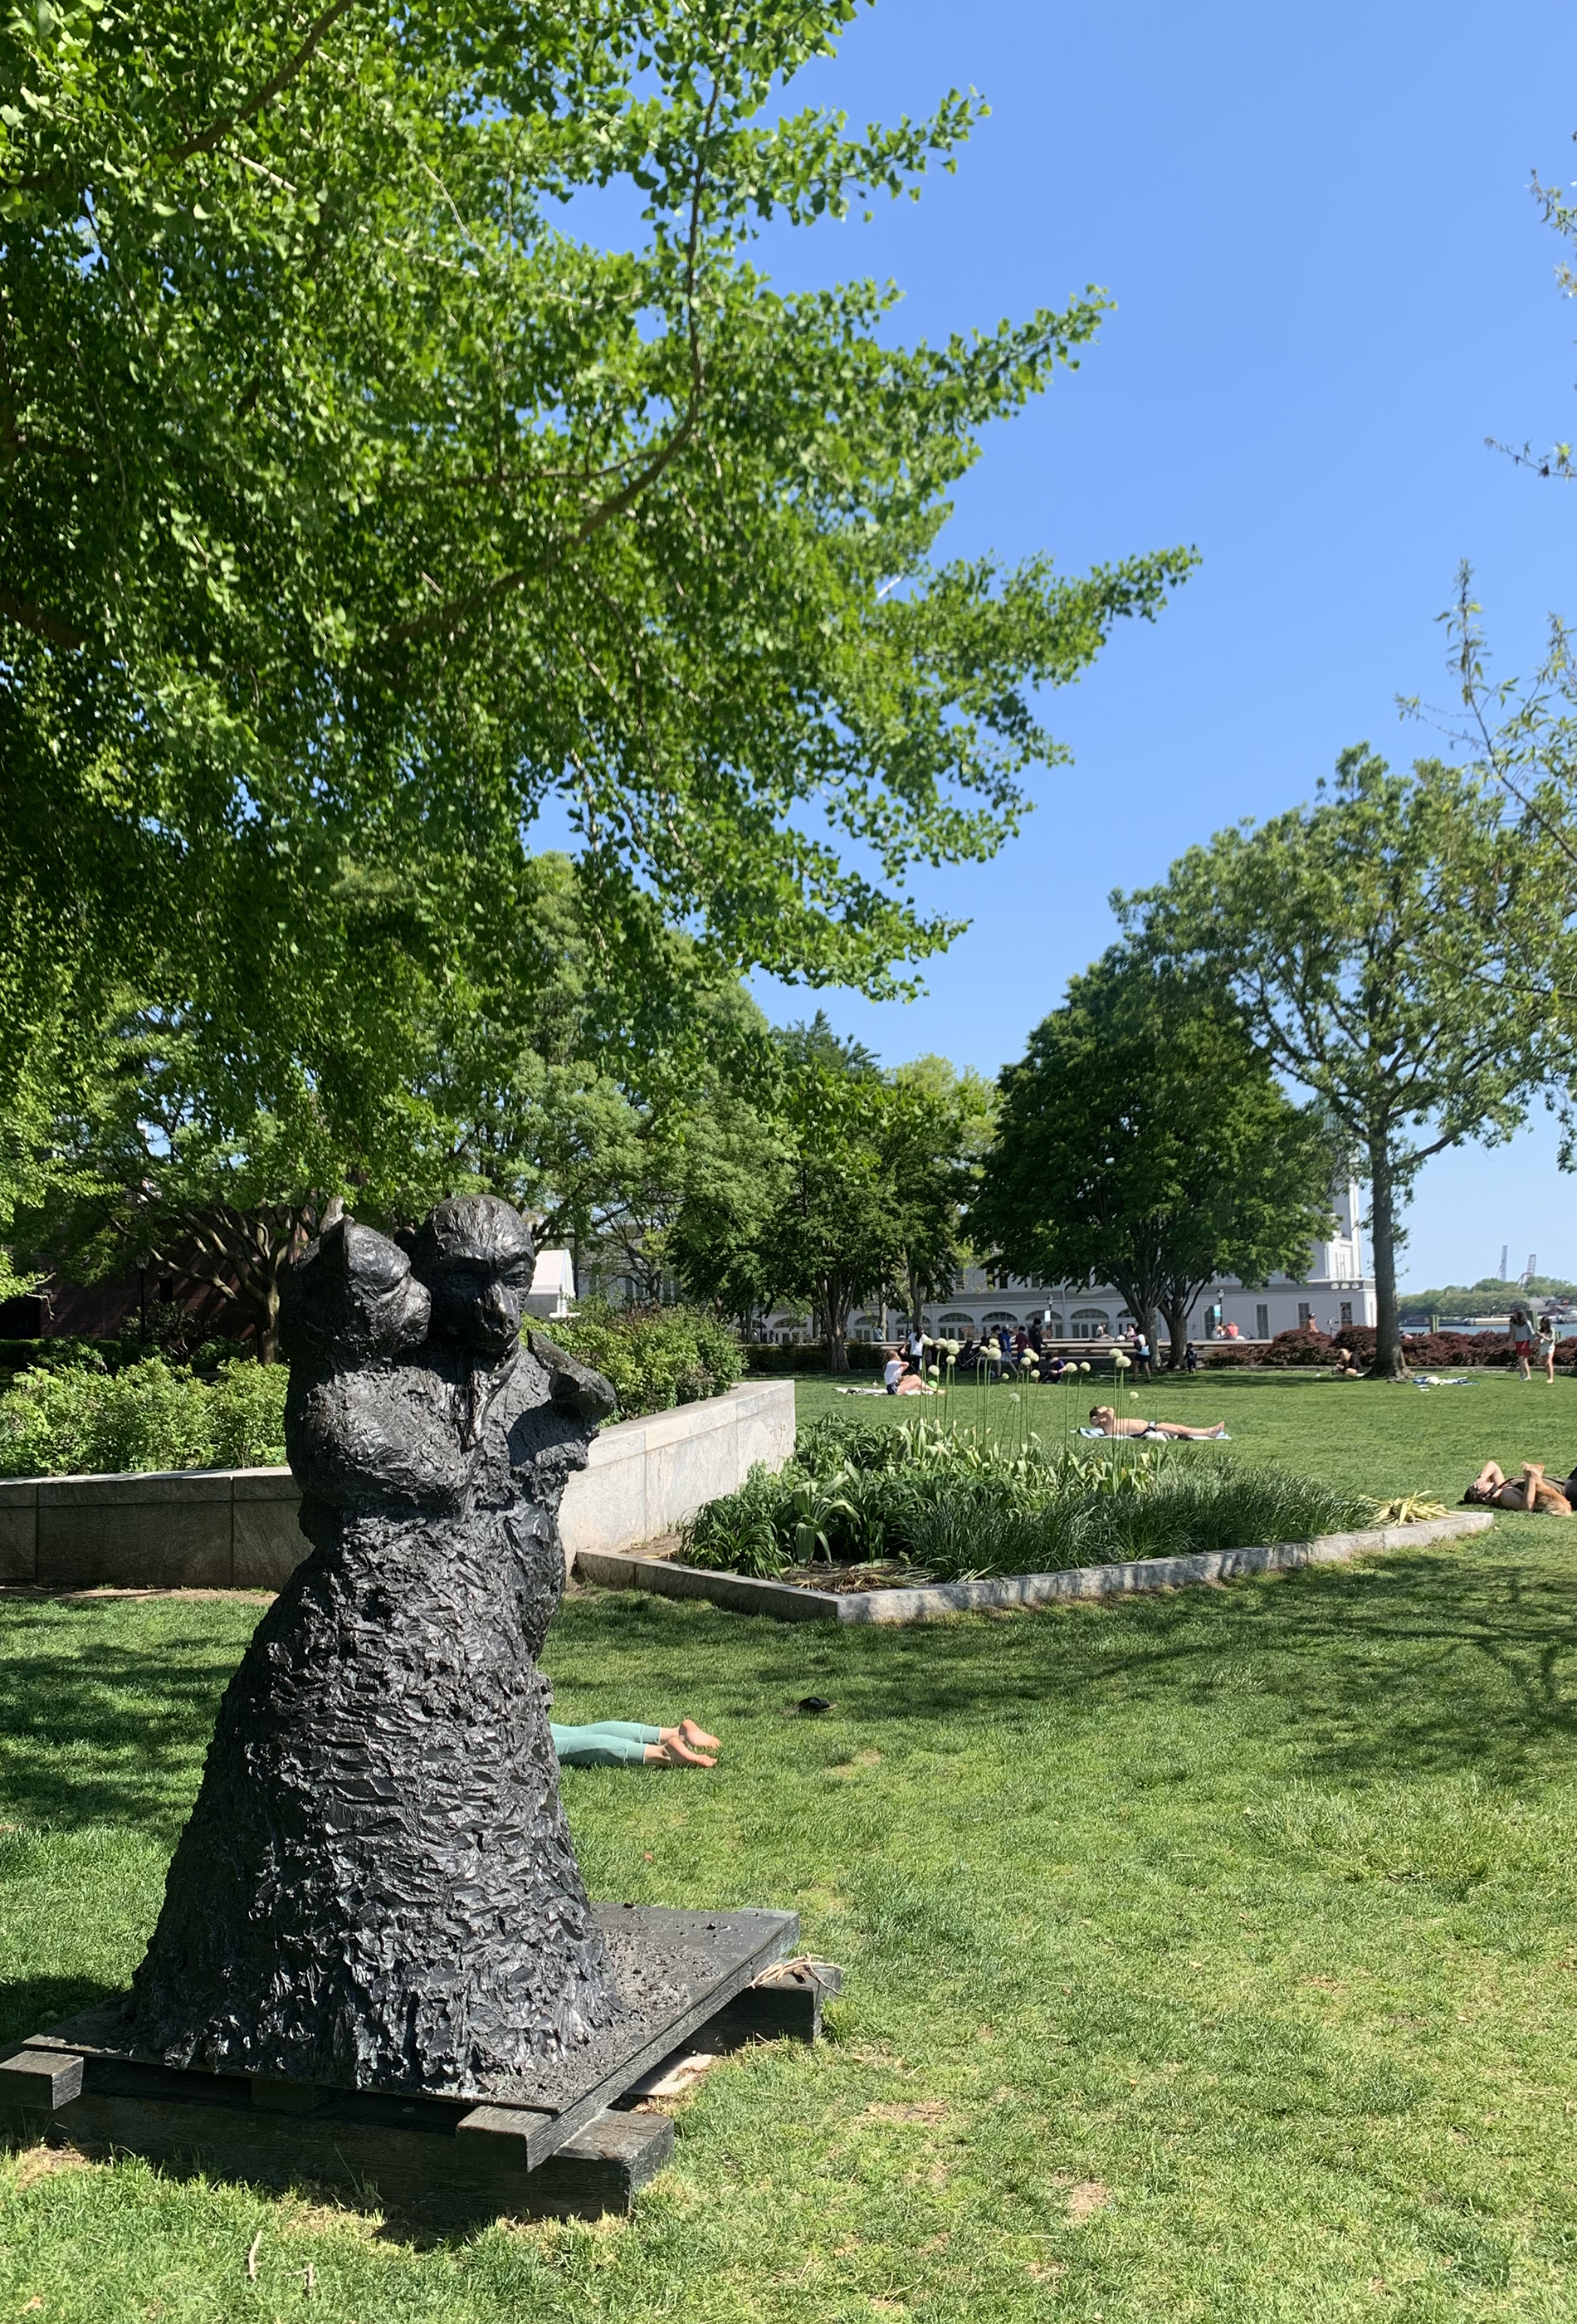 Parks & Public Art: Statues & Sculptures in BPC at The Skyscraper Museum